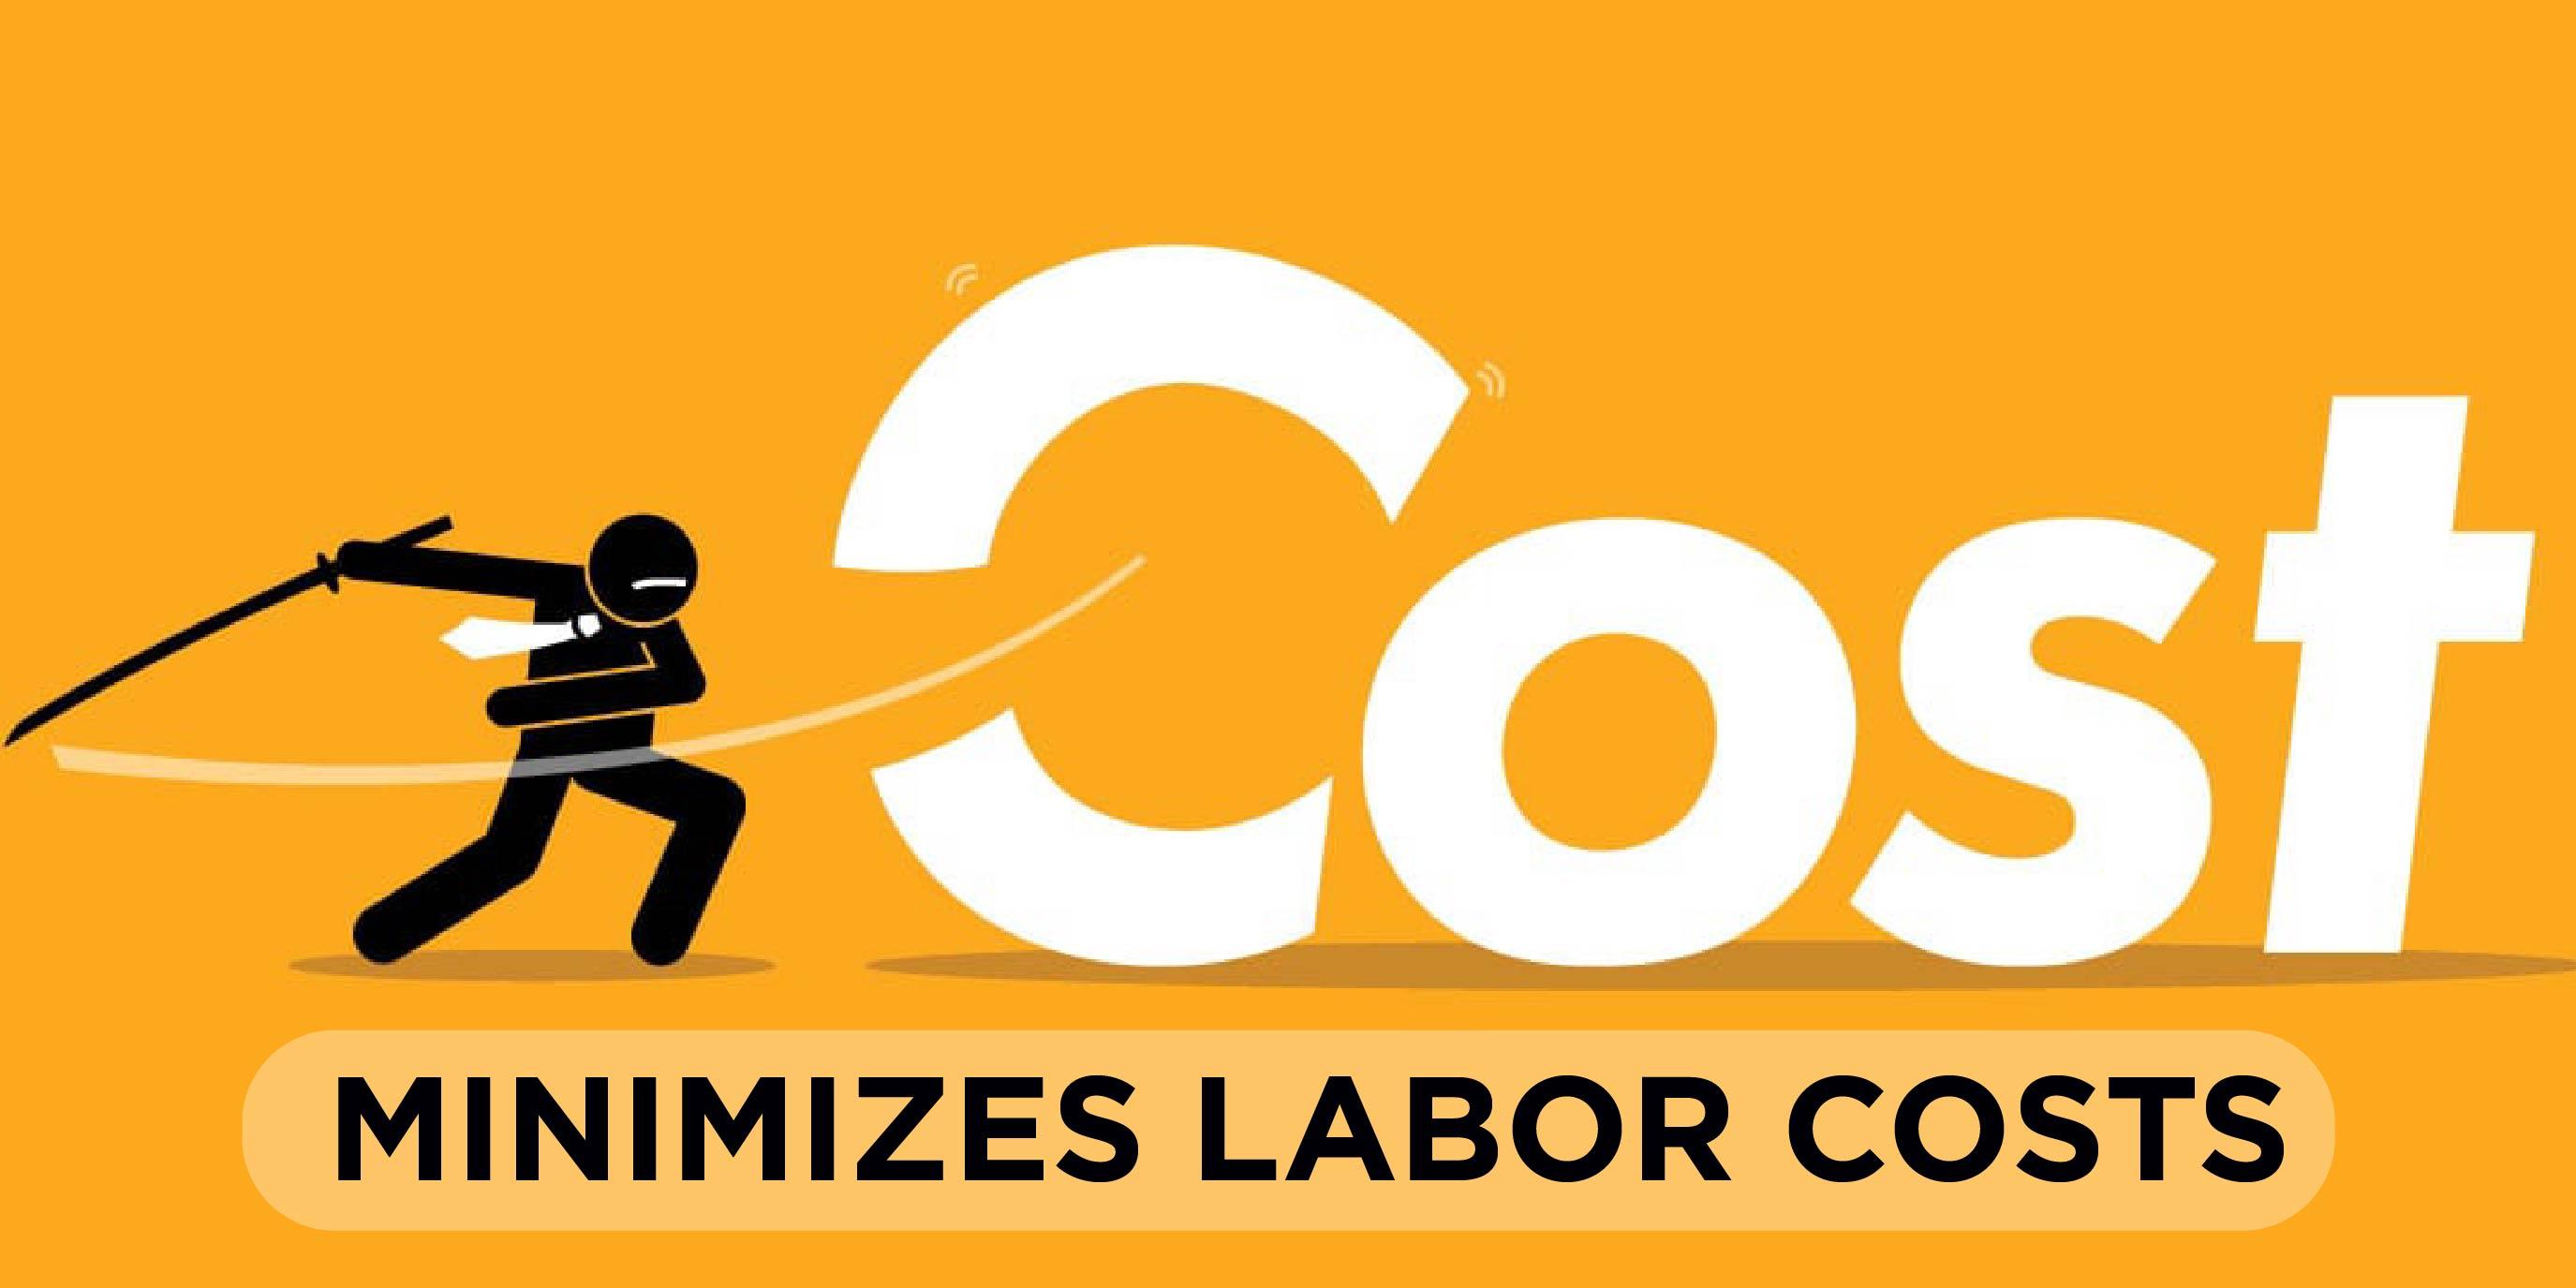 Minimizes Labor Costs 01